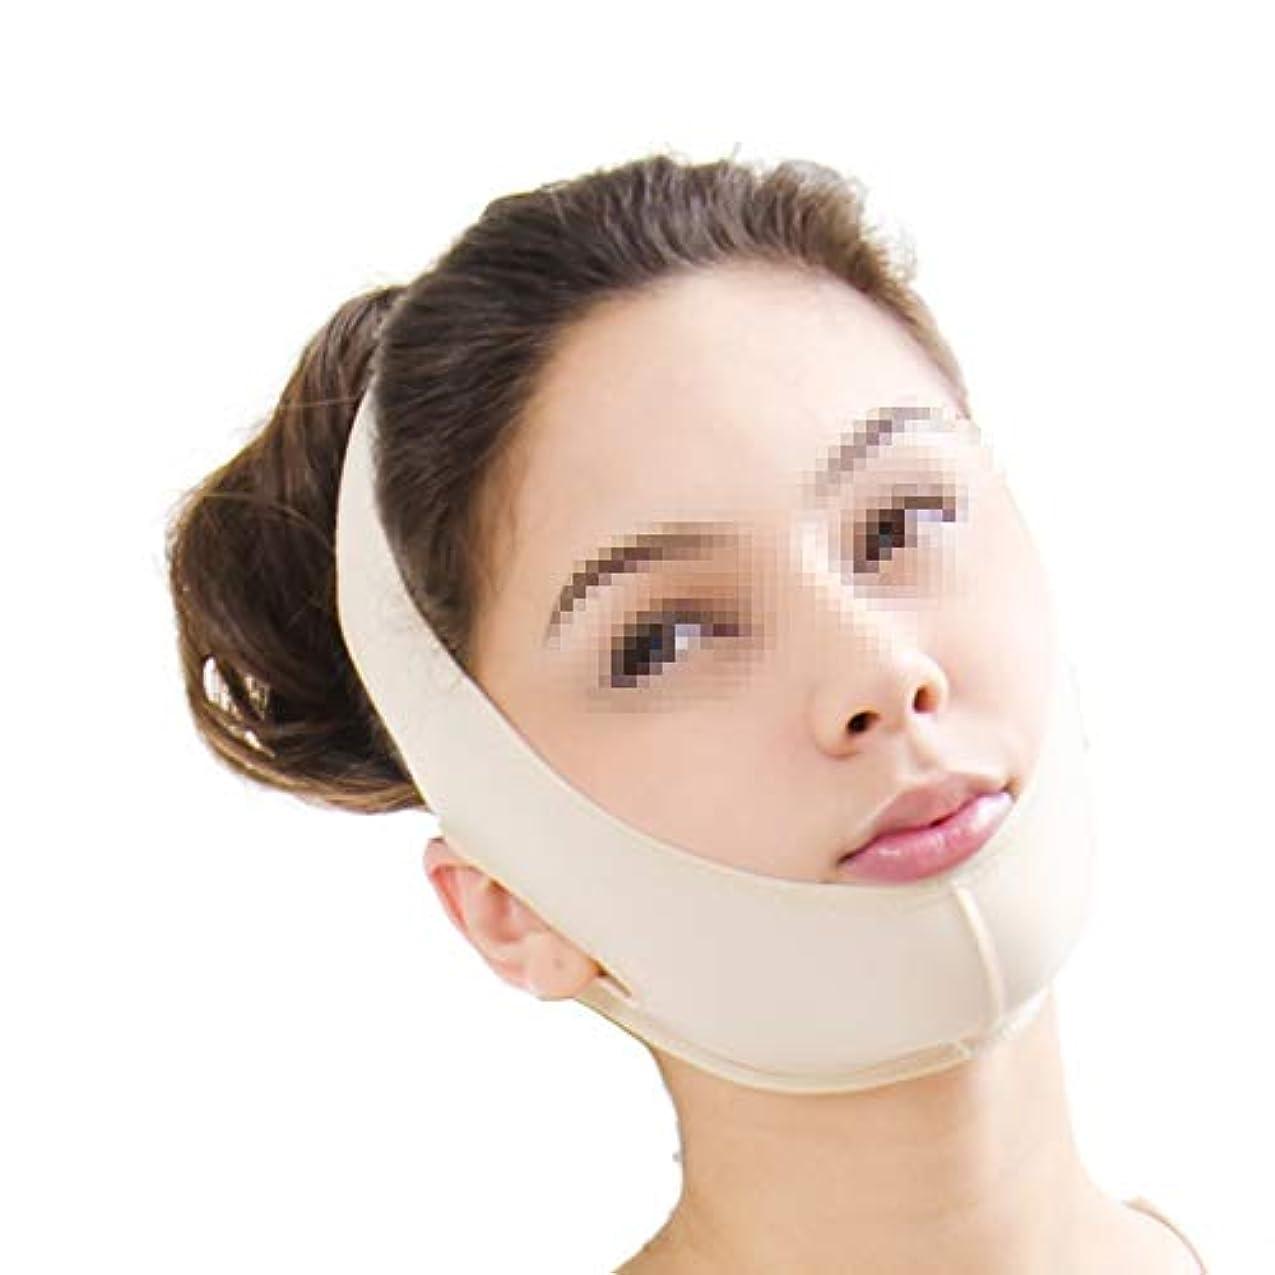 XHLMRMJ フェイスリフトマスク、圧縮後の顎顔面二重あご化粧品脂肪吸引小さな顔包帯弾性ヘッドギア (Size : XL)